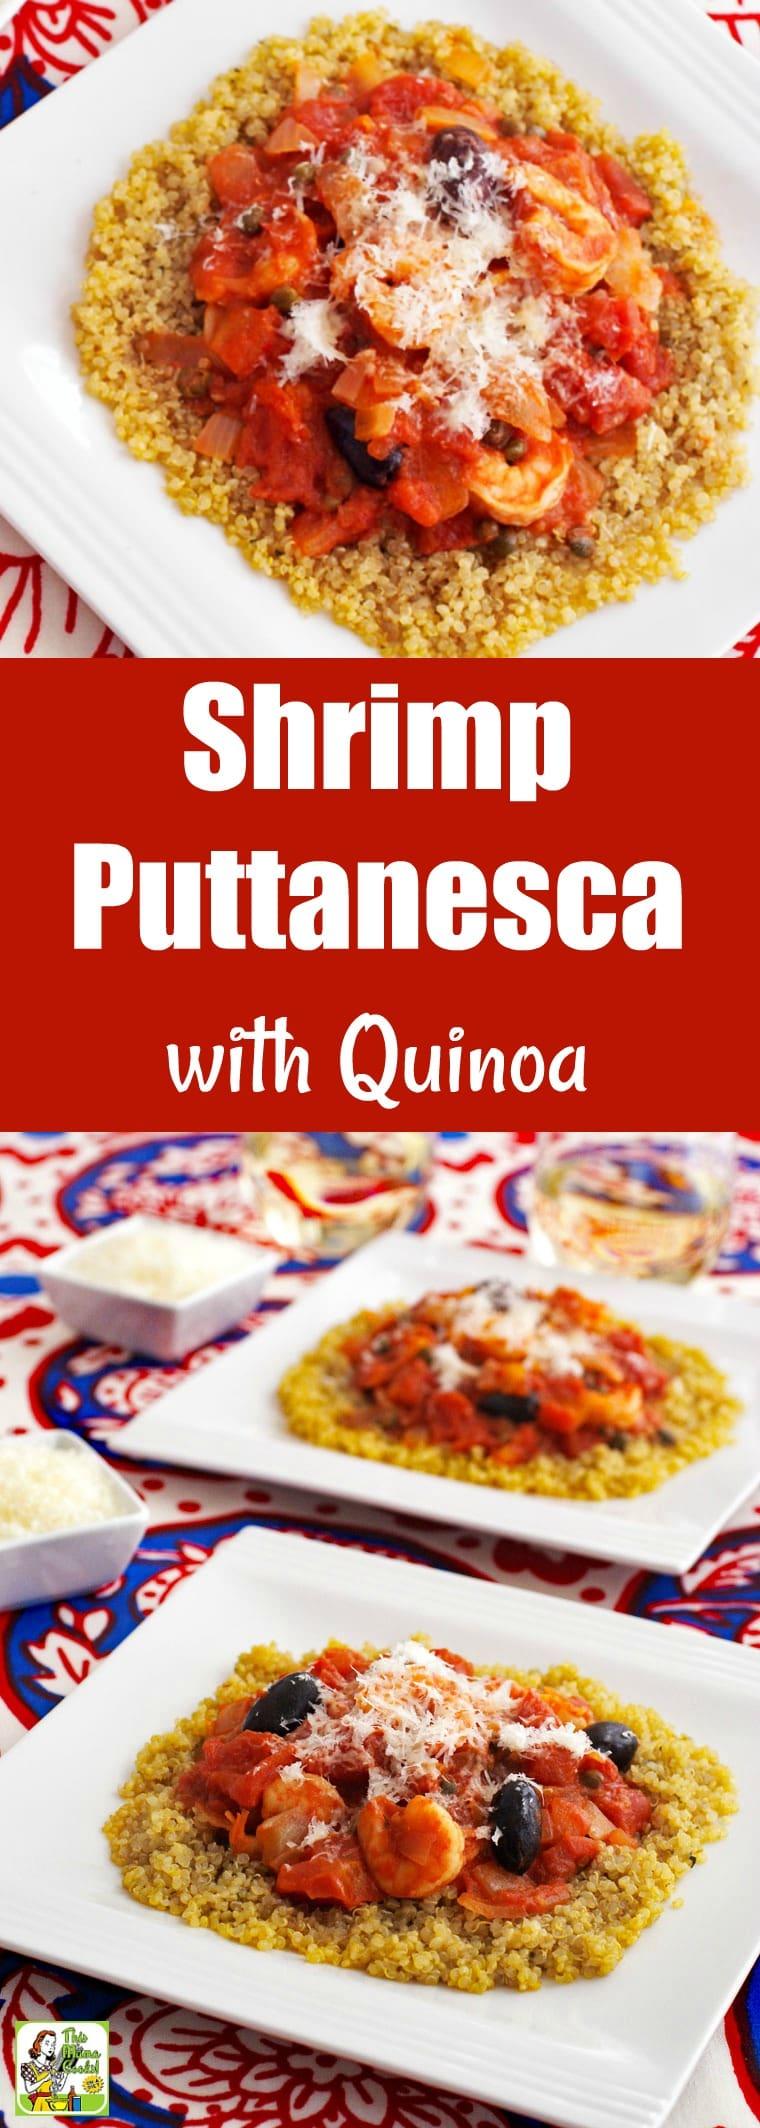 Shrimp Puttanesca with Quinoa